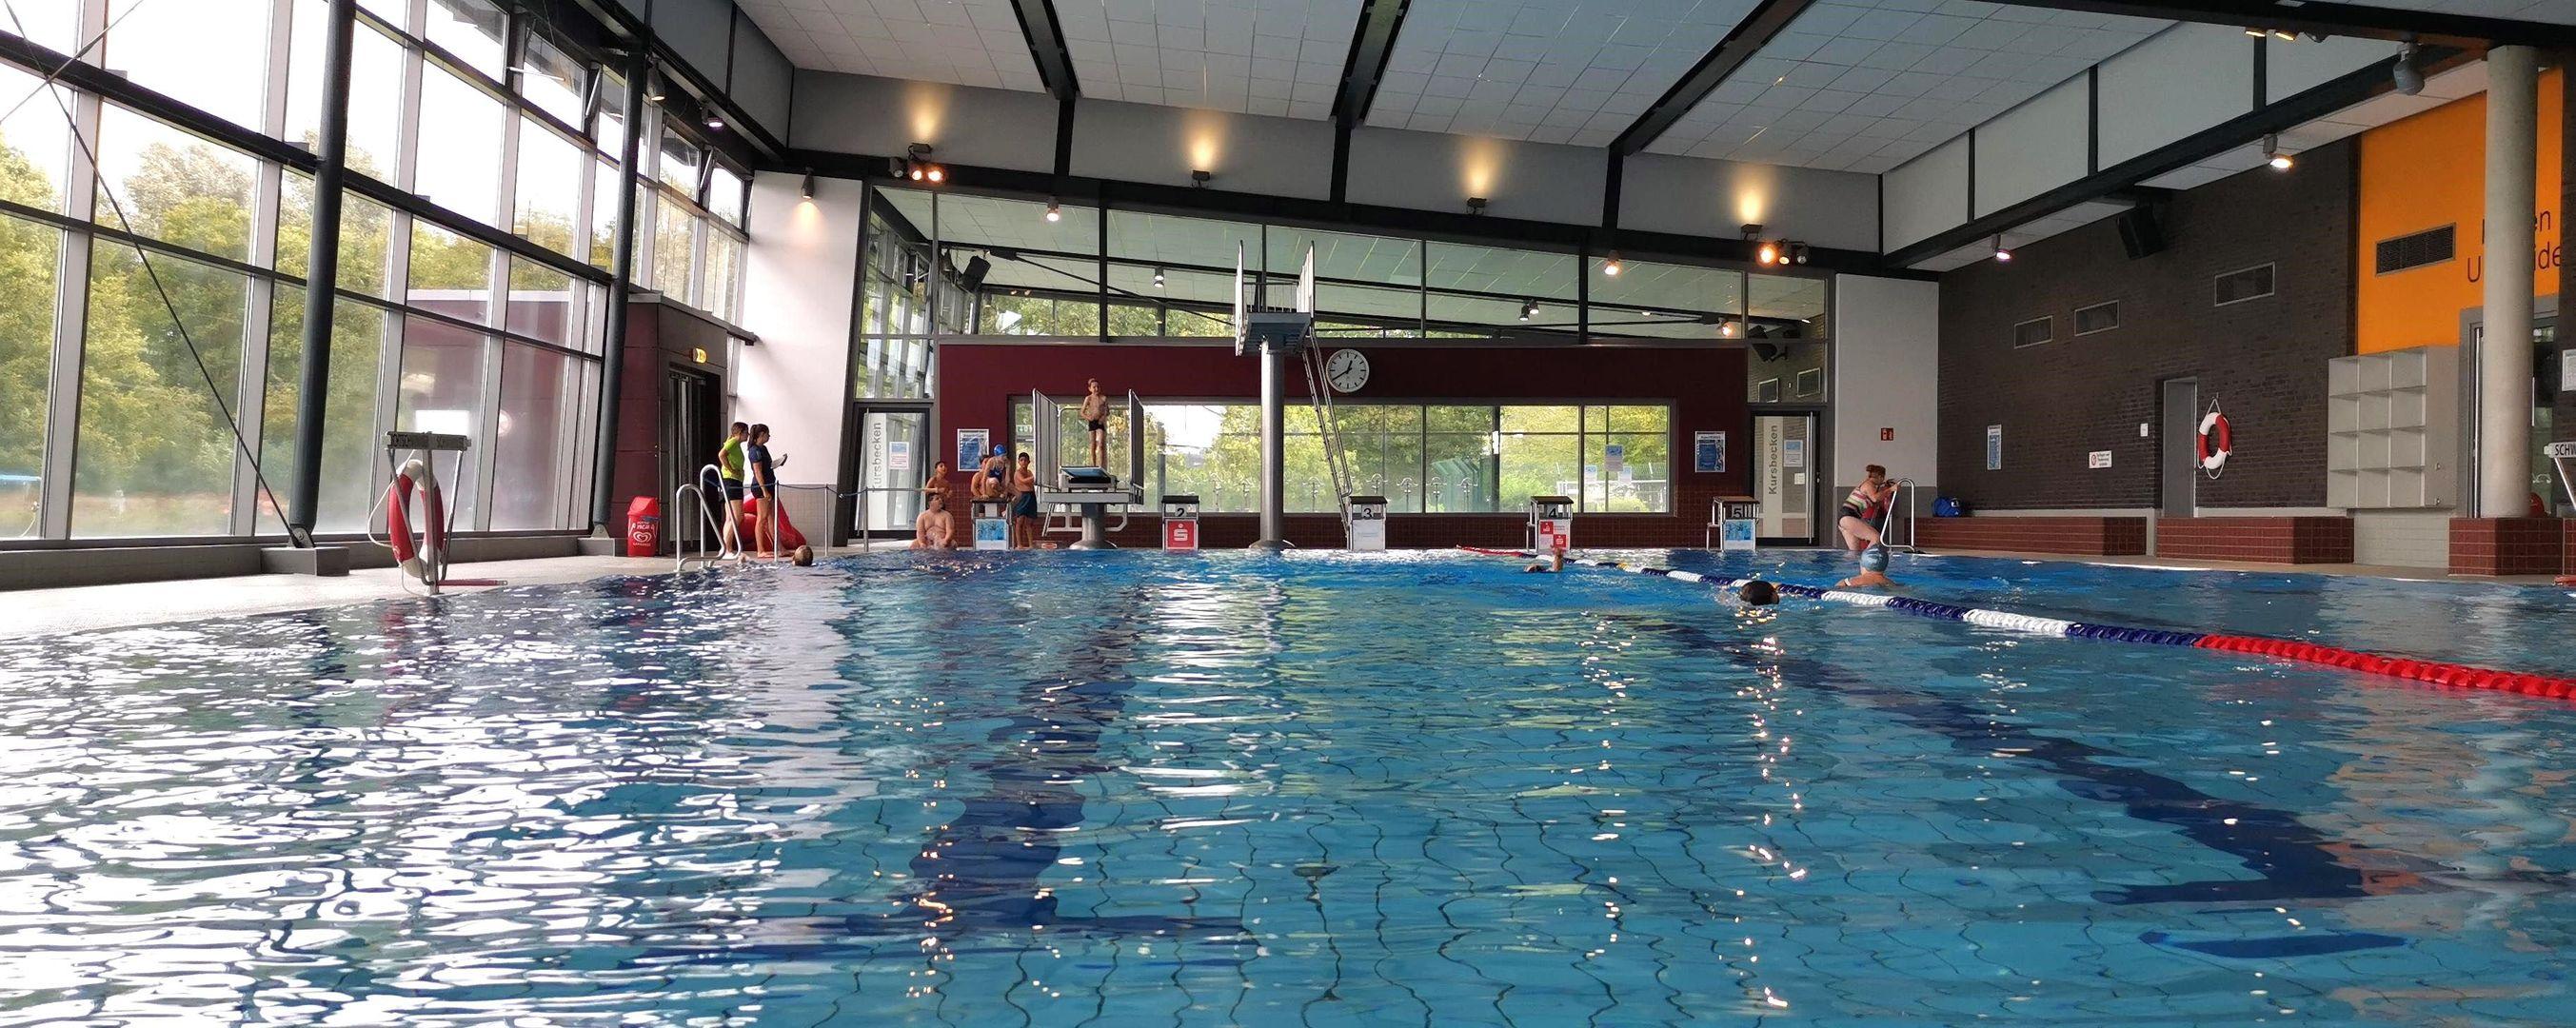 Sportbecken (Mehrzweckbecken) | AquAHAUS